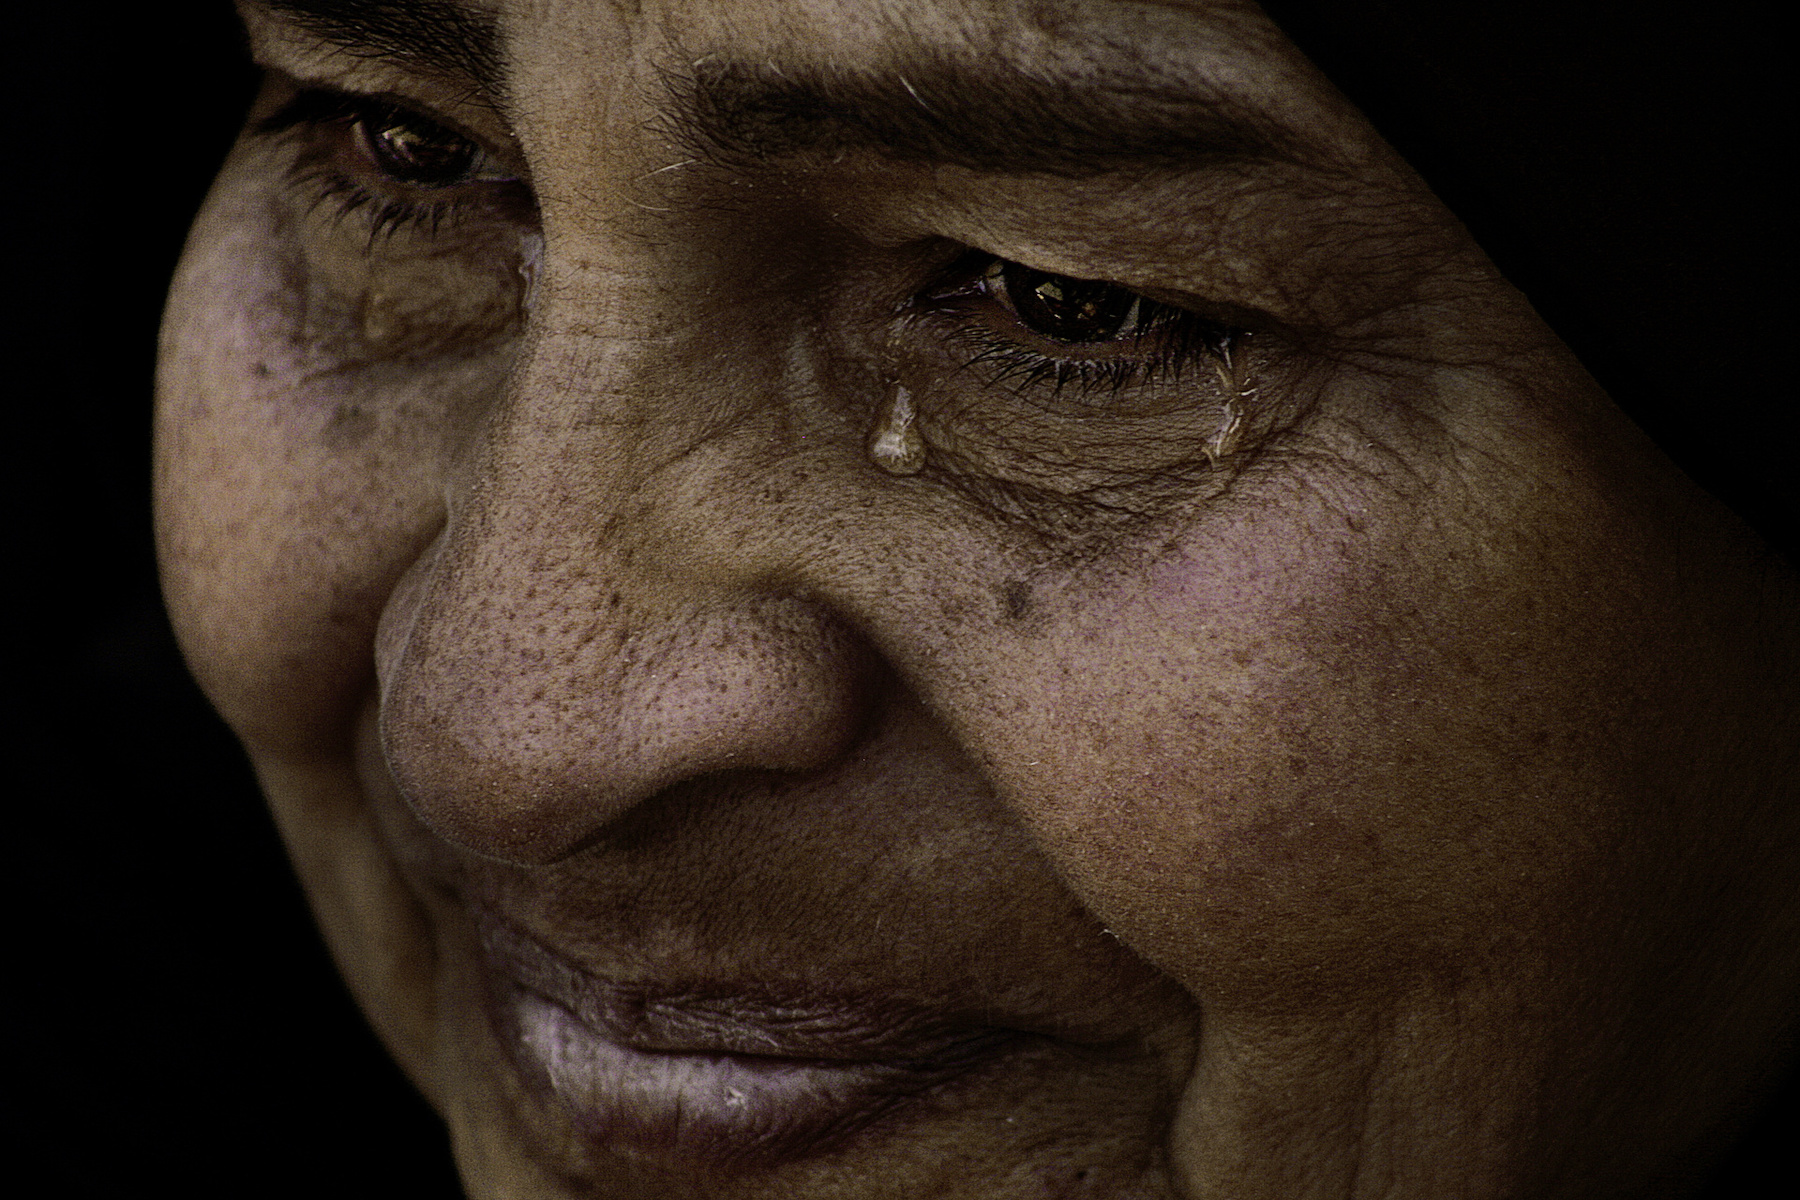 Laura_El-Tantawy_In the Shadow of the Pyramids_Safeya's Tears_05.JPG